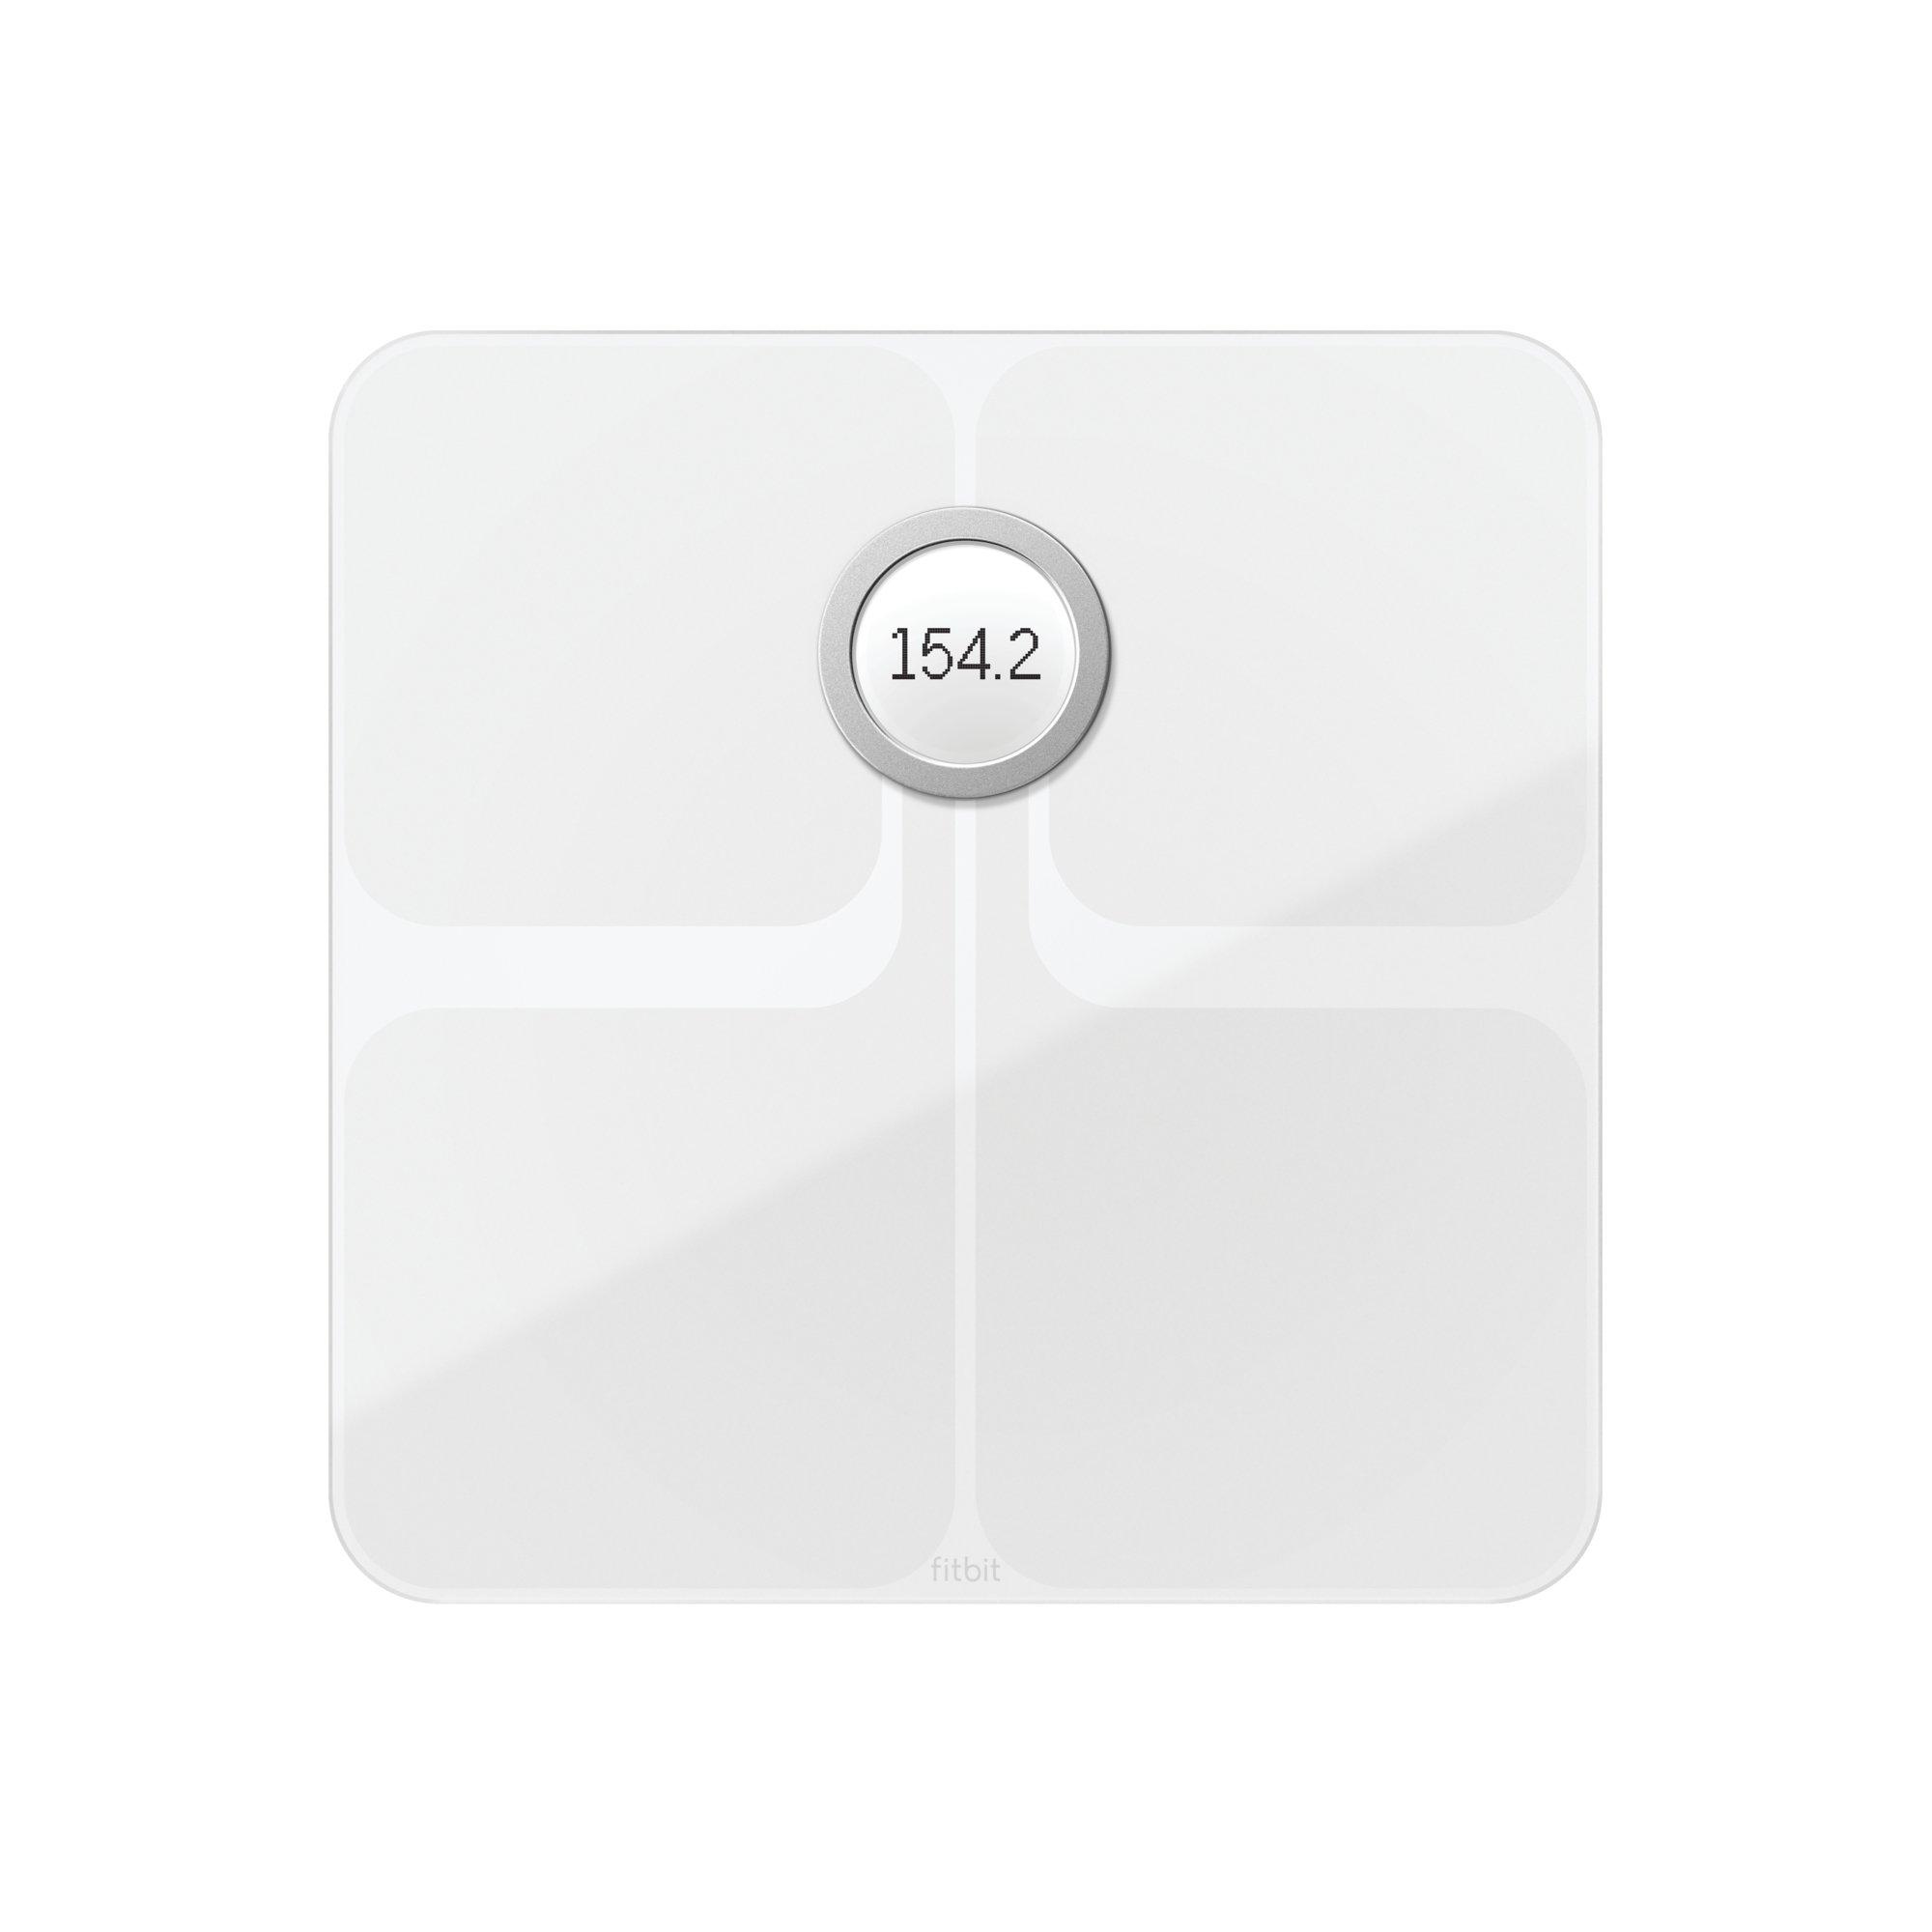 Fitbit Aria 2 Báscula Wi-Fi Inteligente, Unisex Adulto